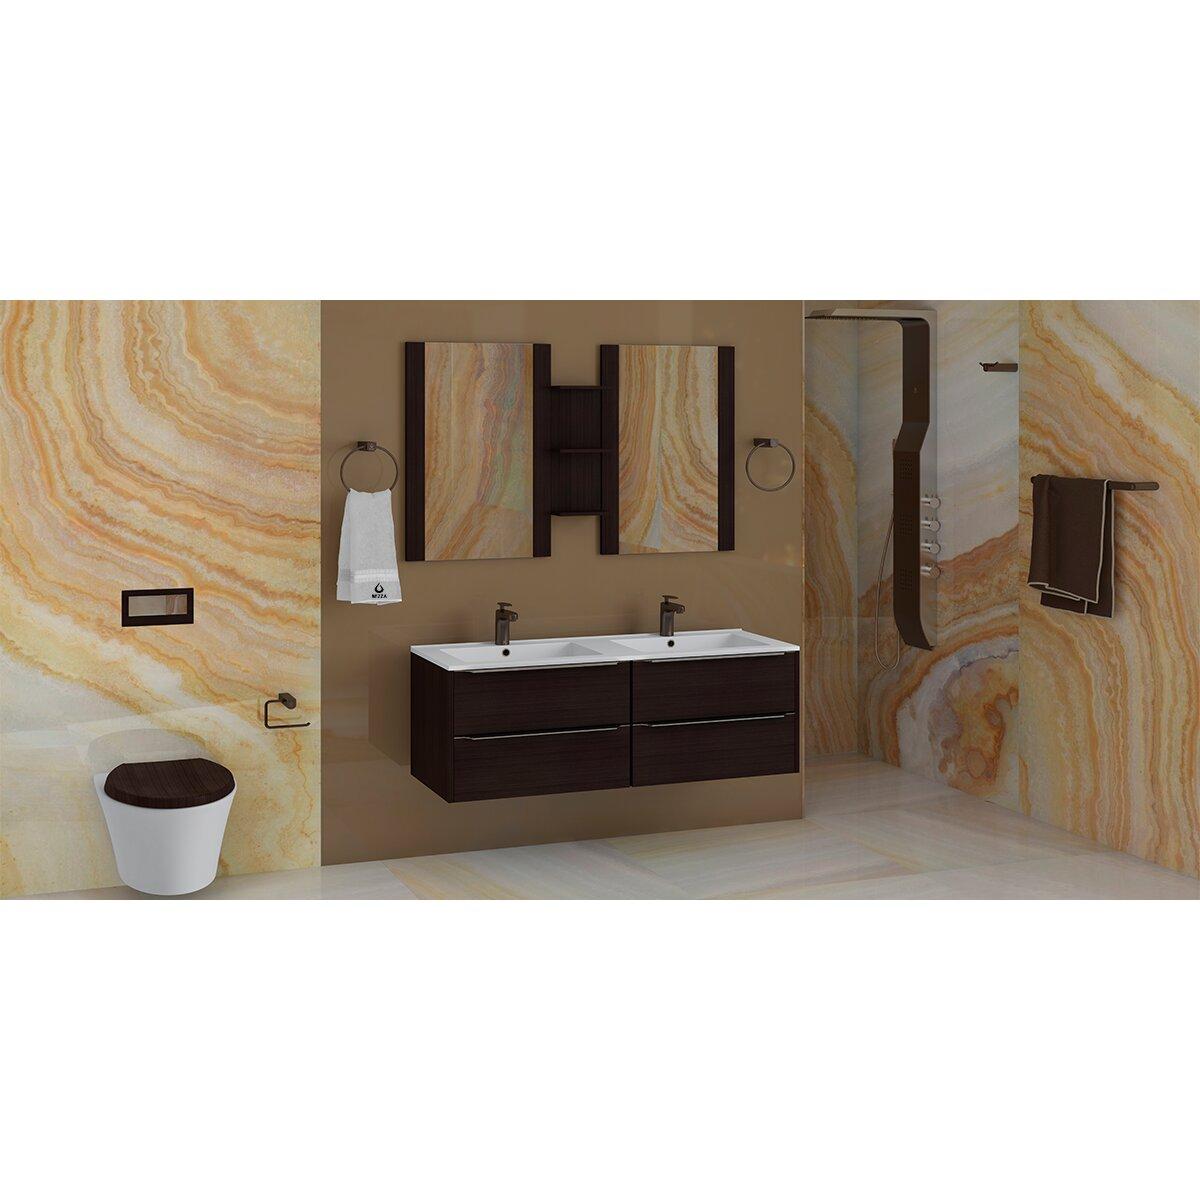 Nezza 4 piece bathroom hardware set wayfair for Bathroom hardware sets